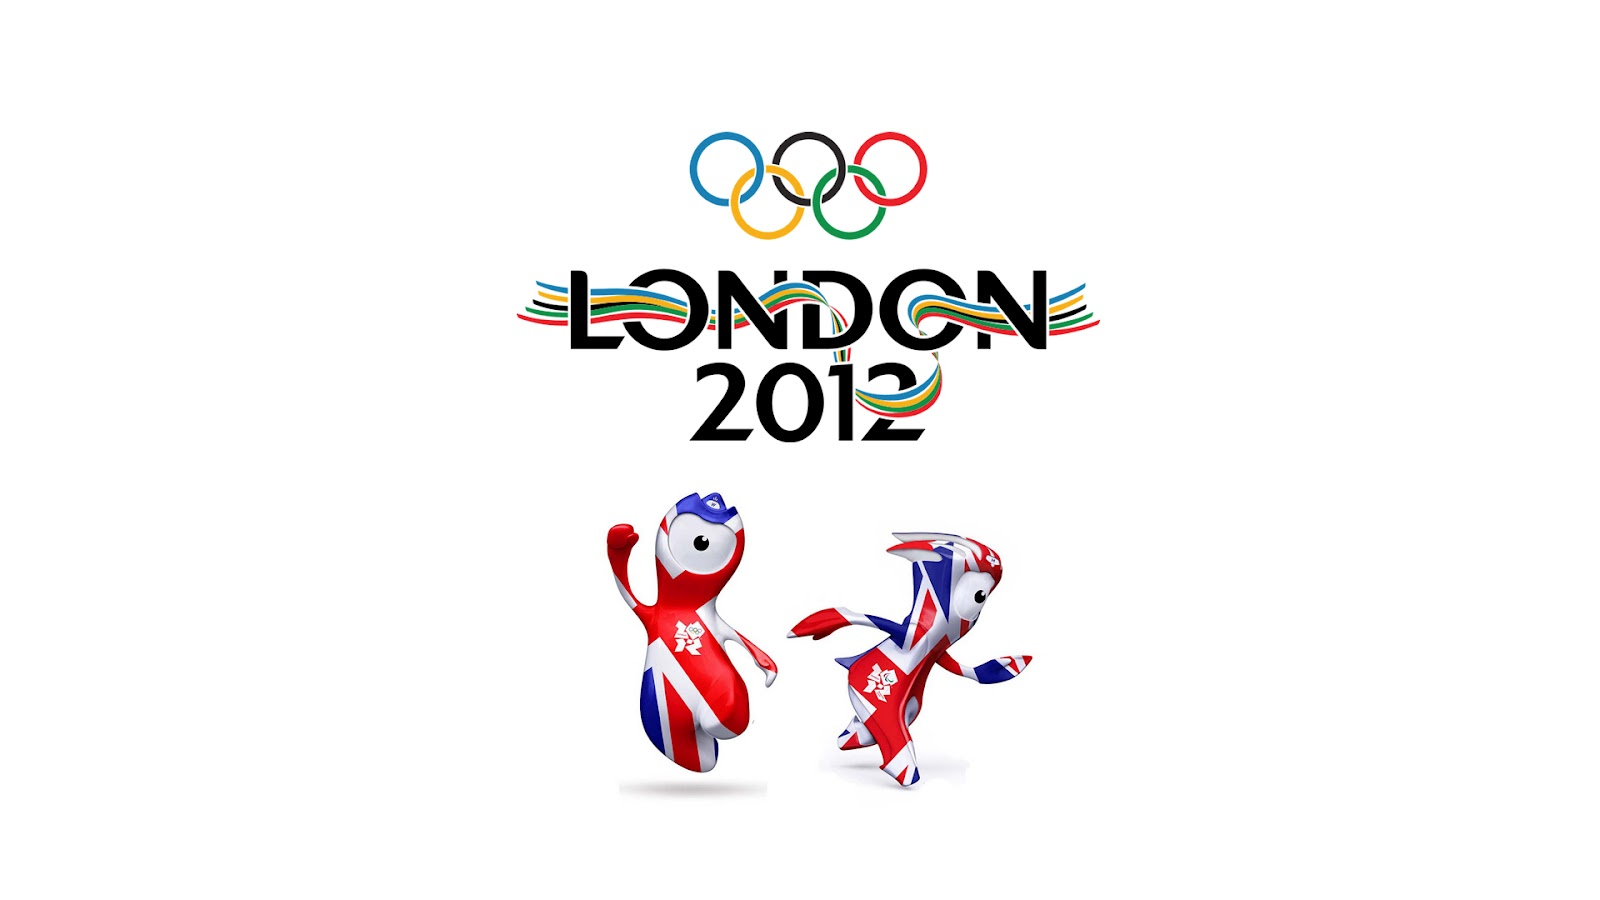 free sport wallpaper olympics - photo #30